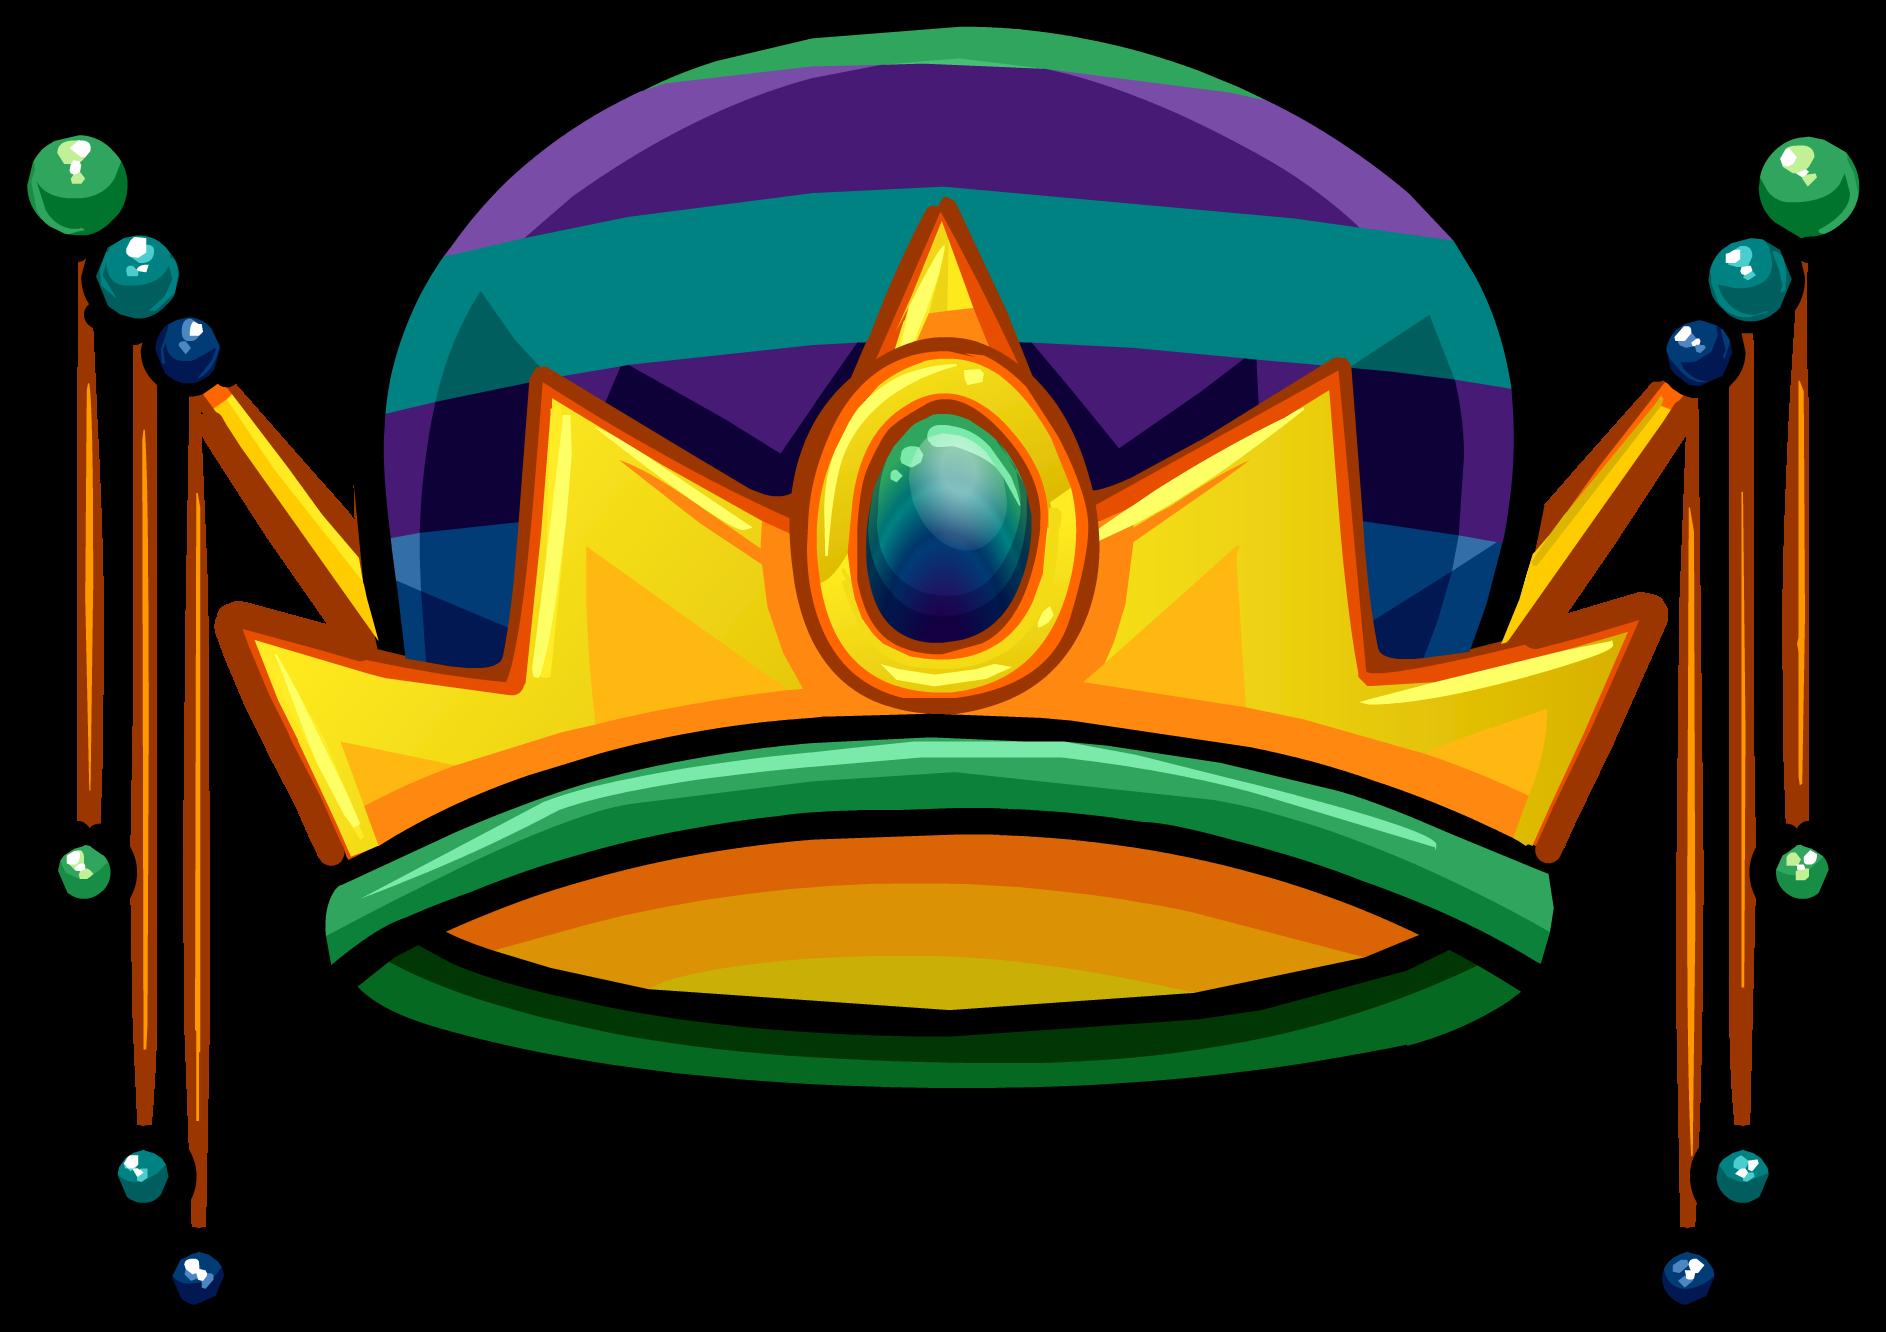 Magical Crown | Club Penguin Wiki | FANDOM powered by Wikia